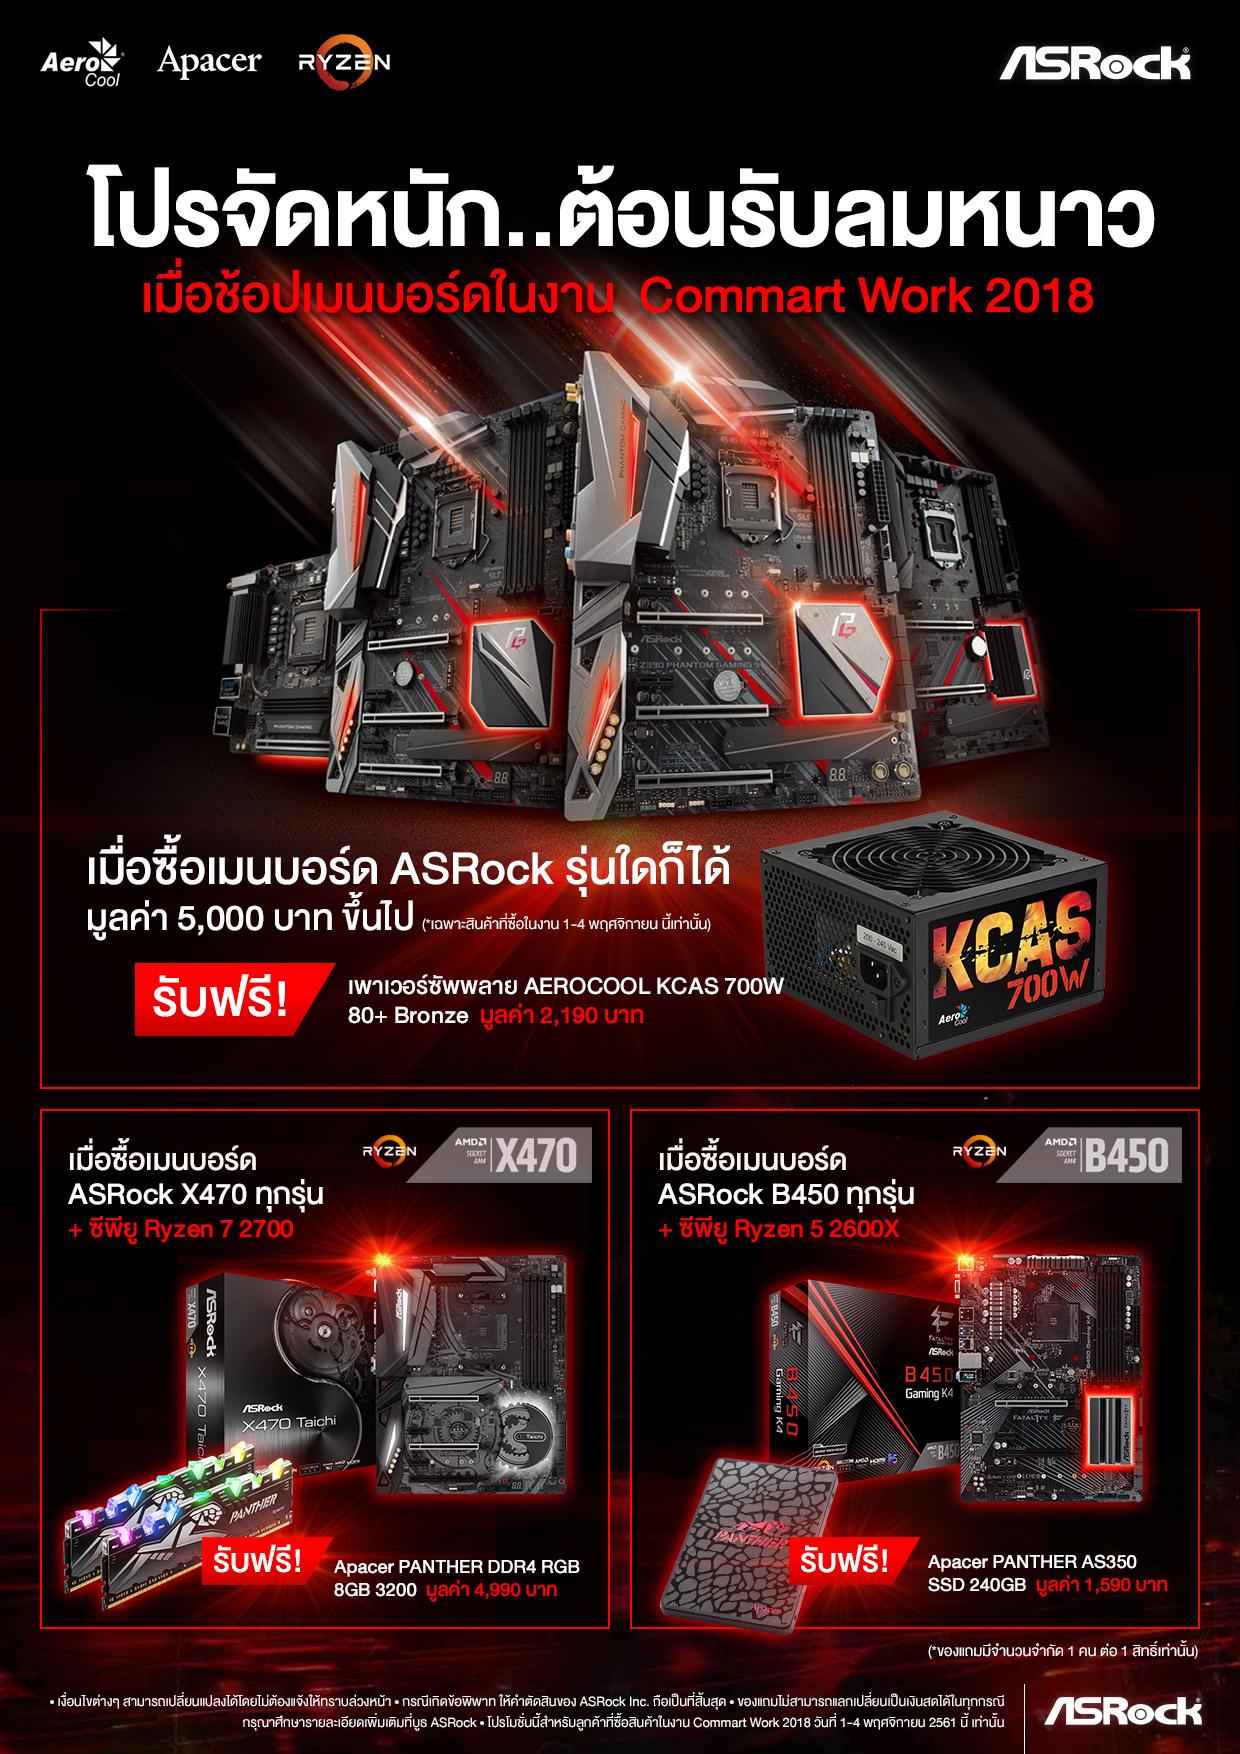 asrock rev2 ASRock จัดโปรสุดคุ้มปลายปีซื้อเมนบอร์ด ฟรี! เพาเวอร์, RAM, SSD ในงาน Commart Work 2018